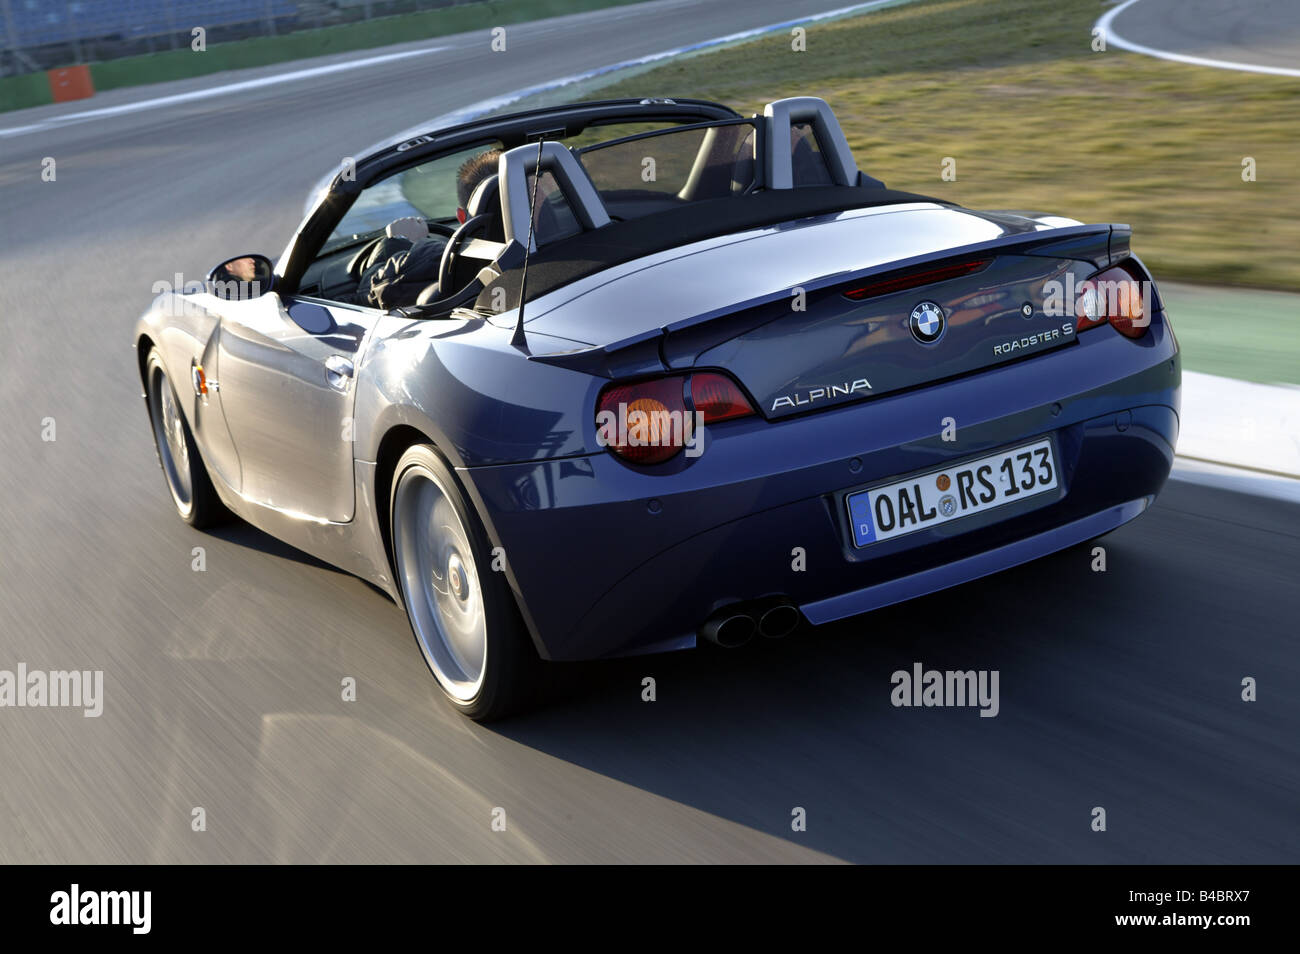 Car, BMW Alpina Roadster S 3.4 / Alpina Z4 3.4S, Convertible, open ...